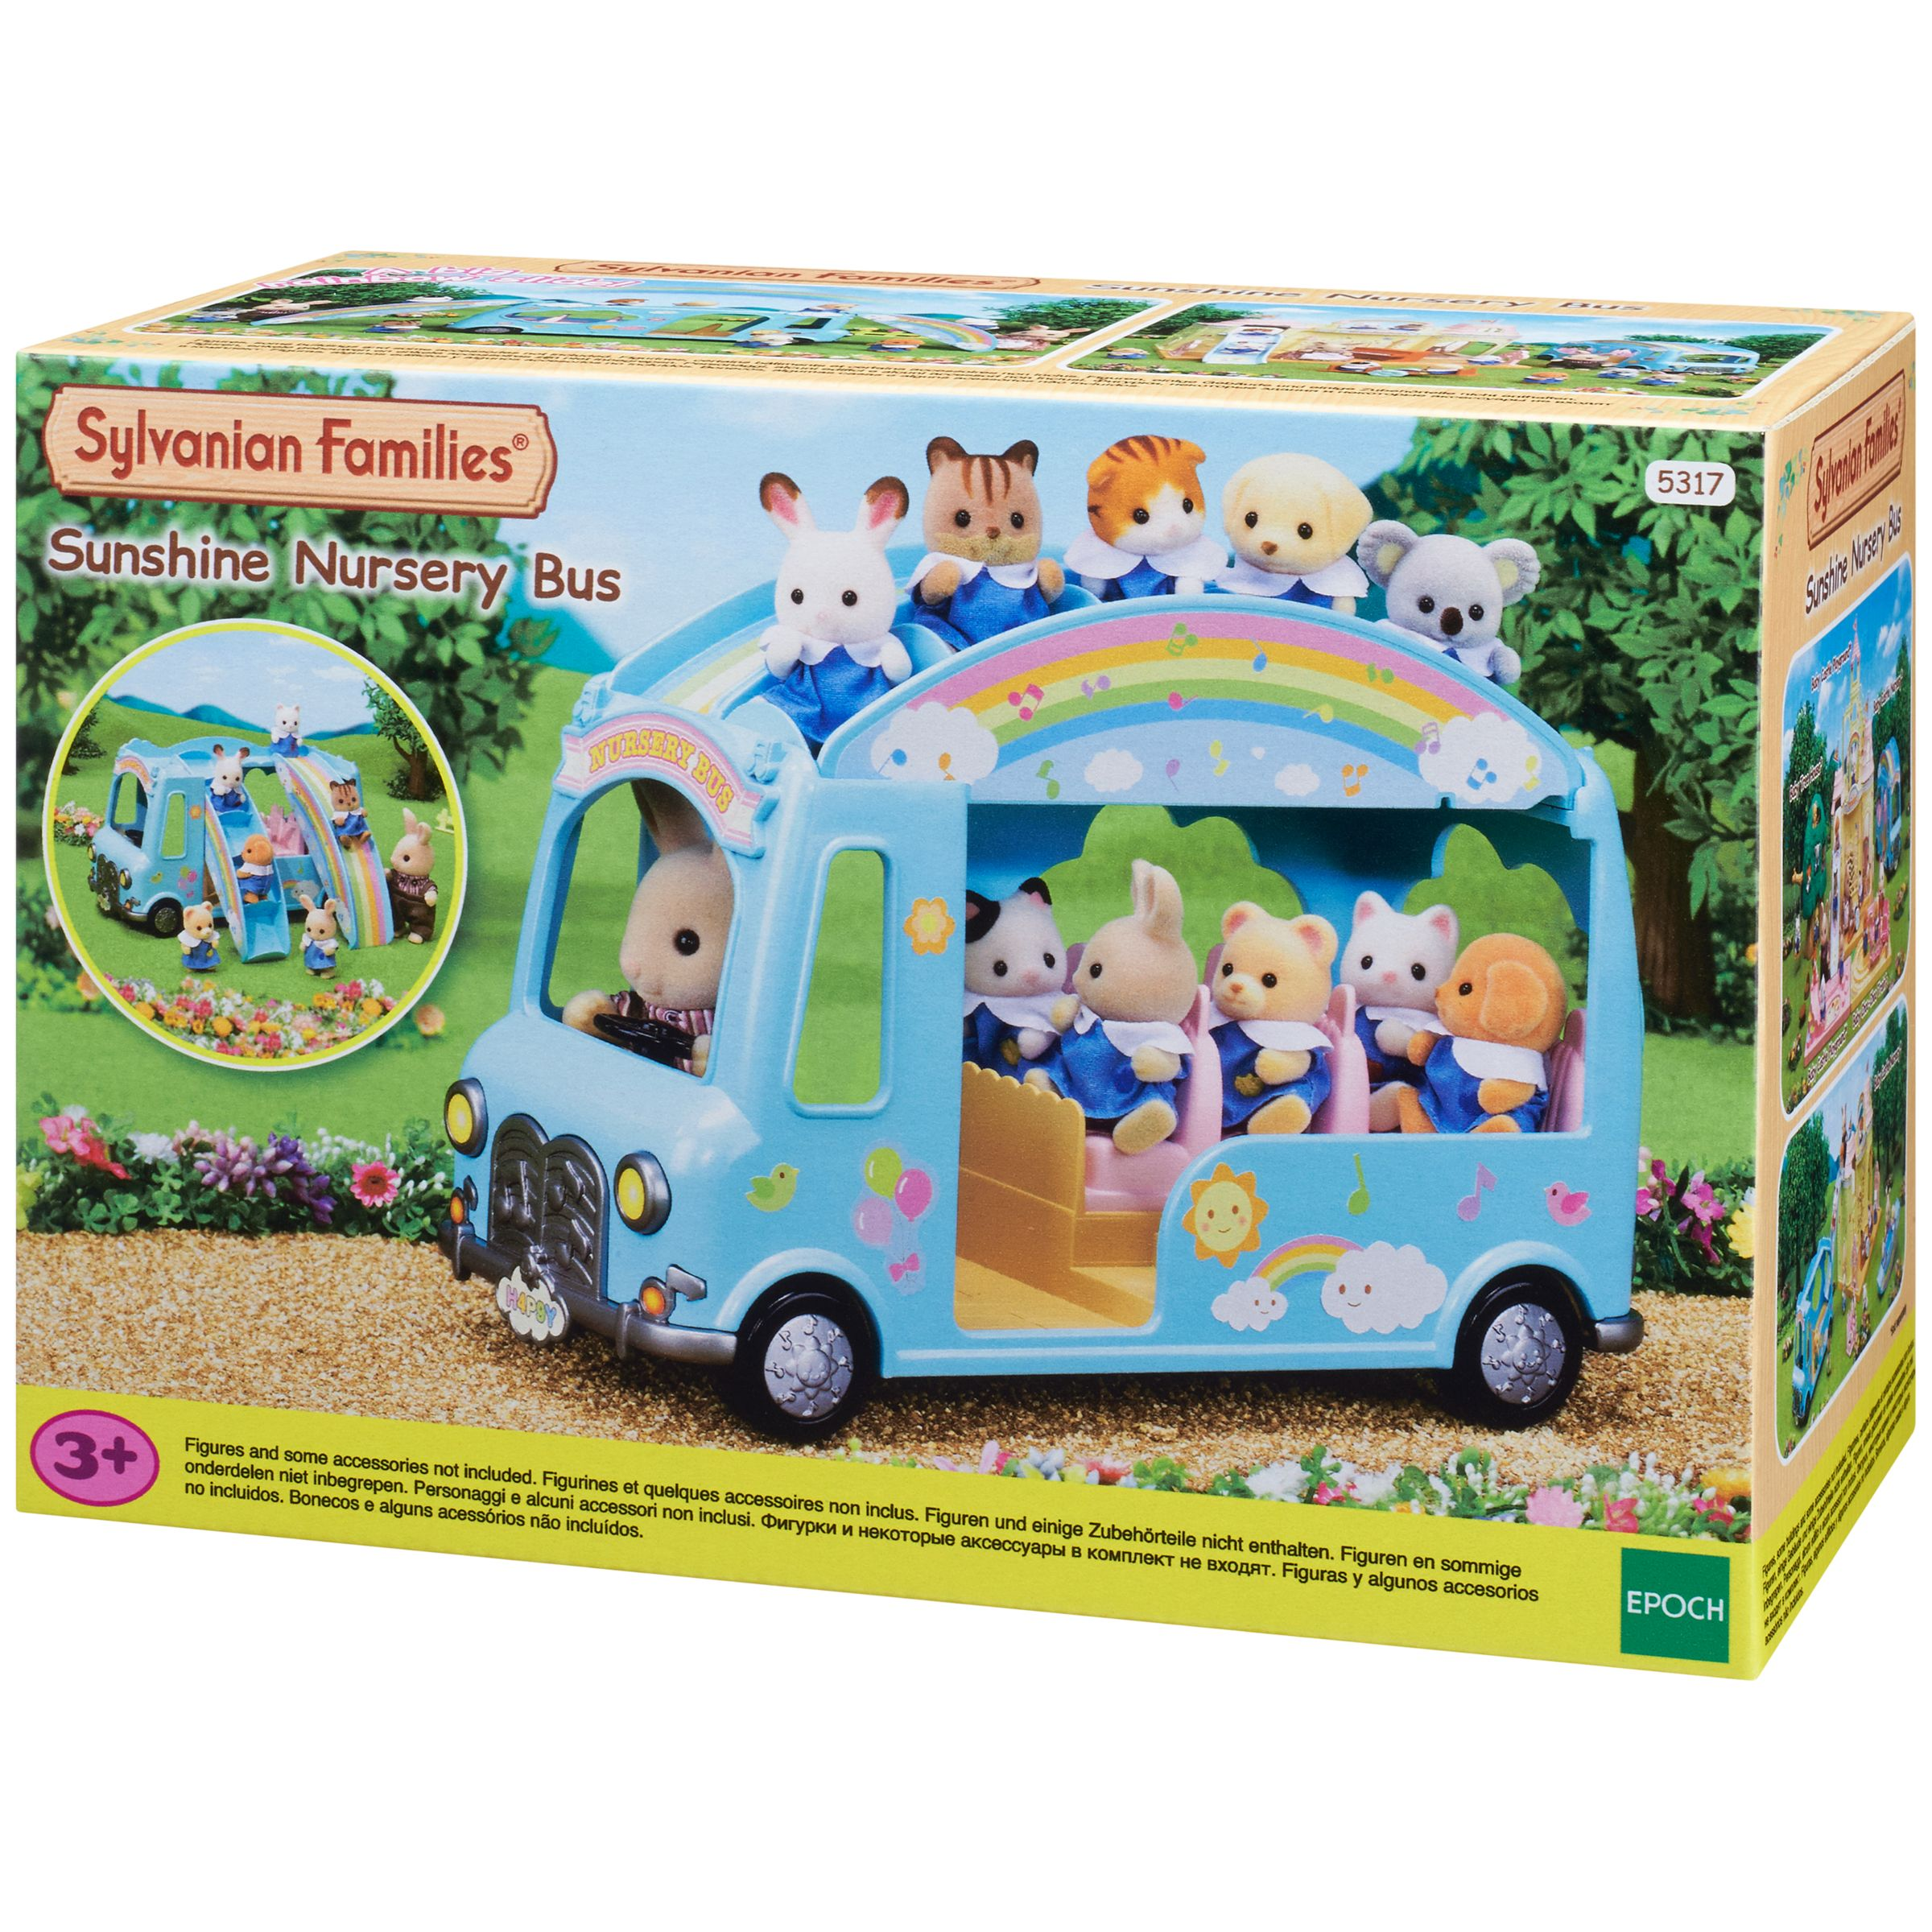 Sylvanian Families Sylvanian Families Sunshine Nursery Bus